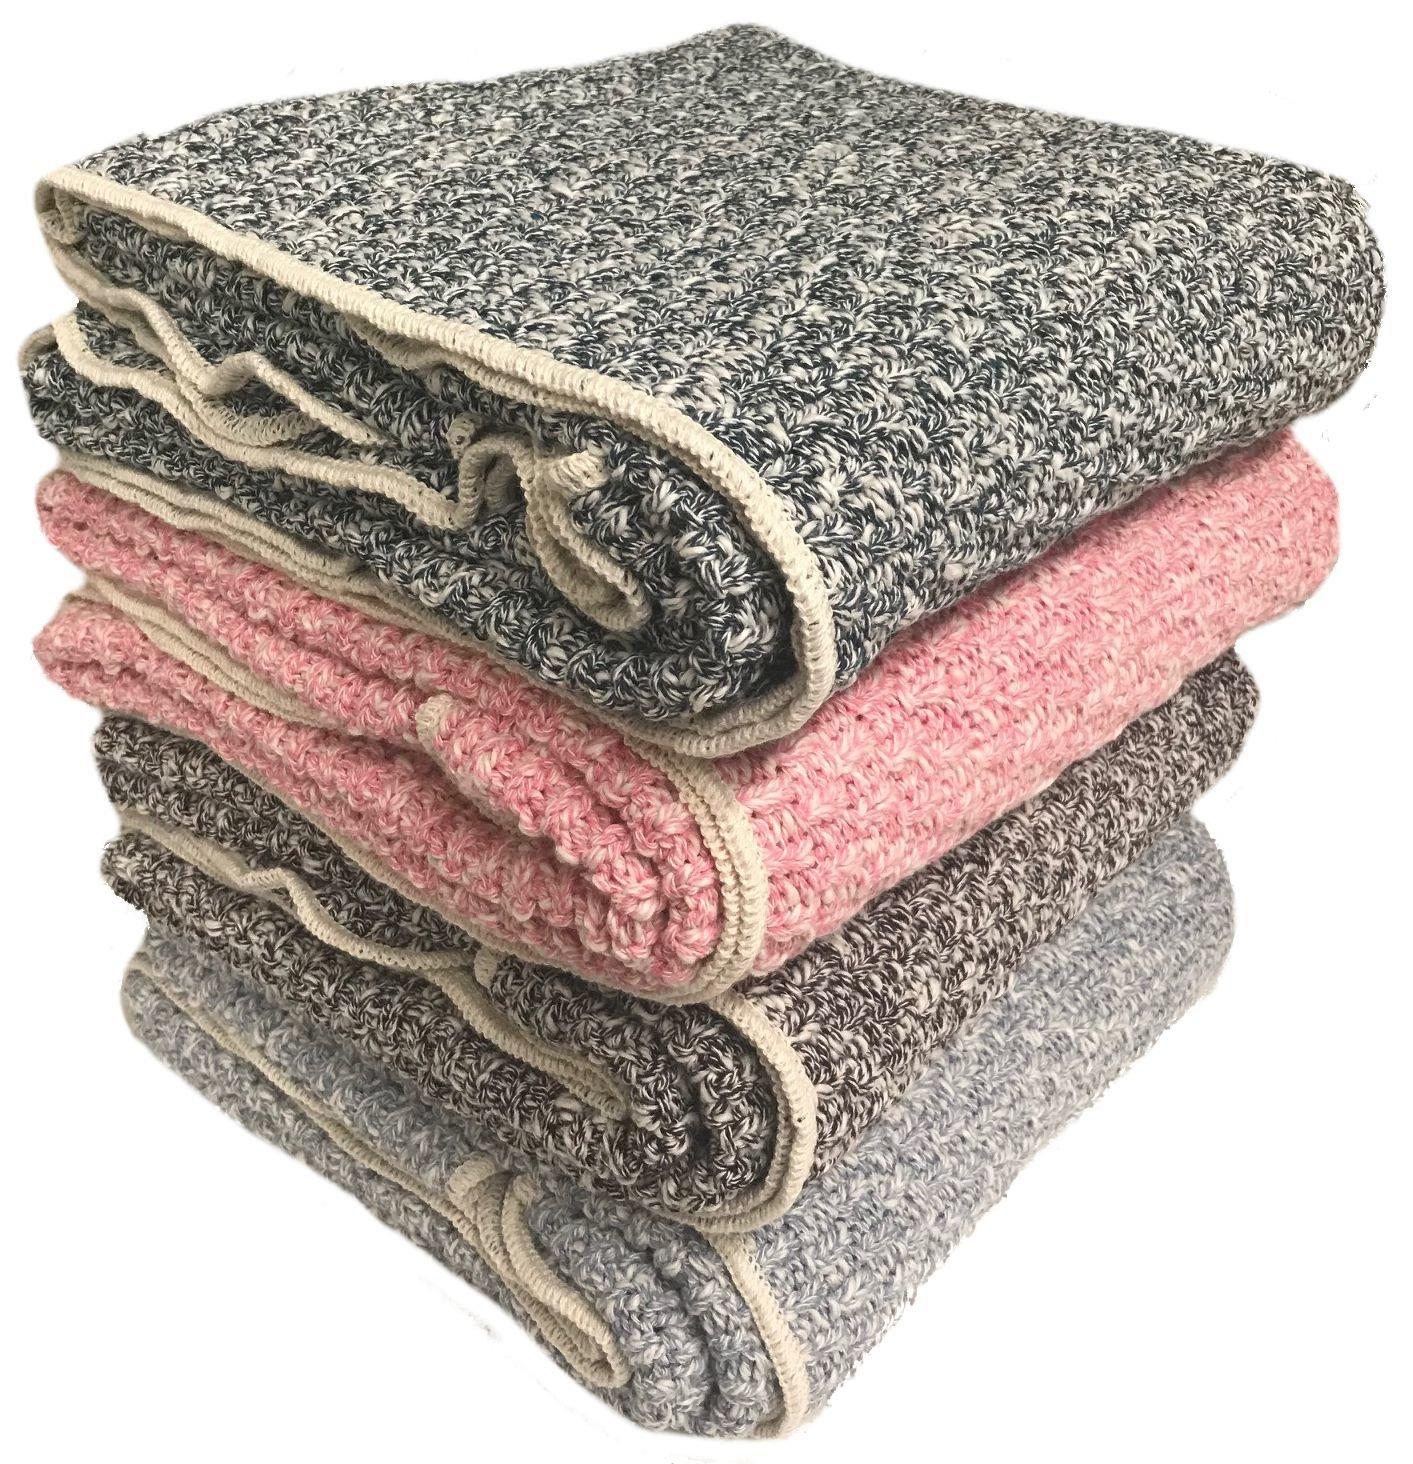 Slub Cotton Throw (4 colors available)